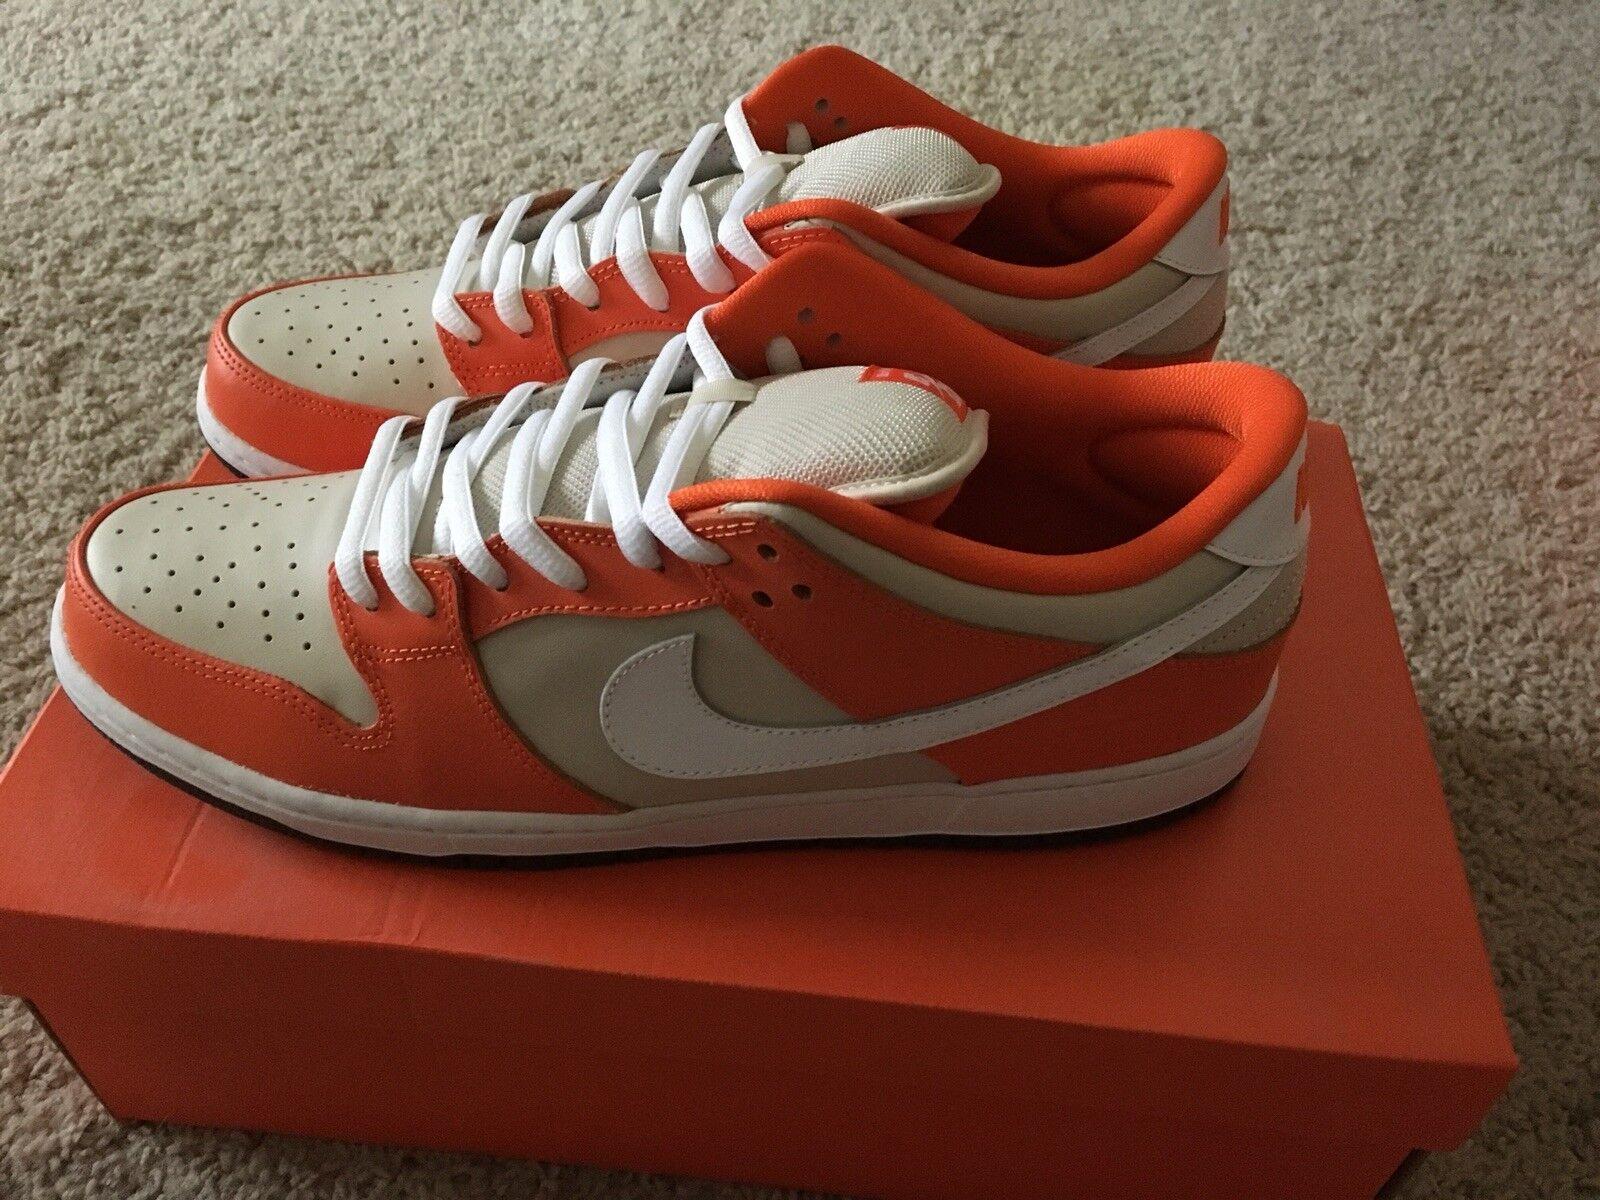 Nike Dunk Low SB Orange Box Size 13 - Rare - Deadstock